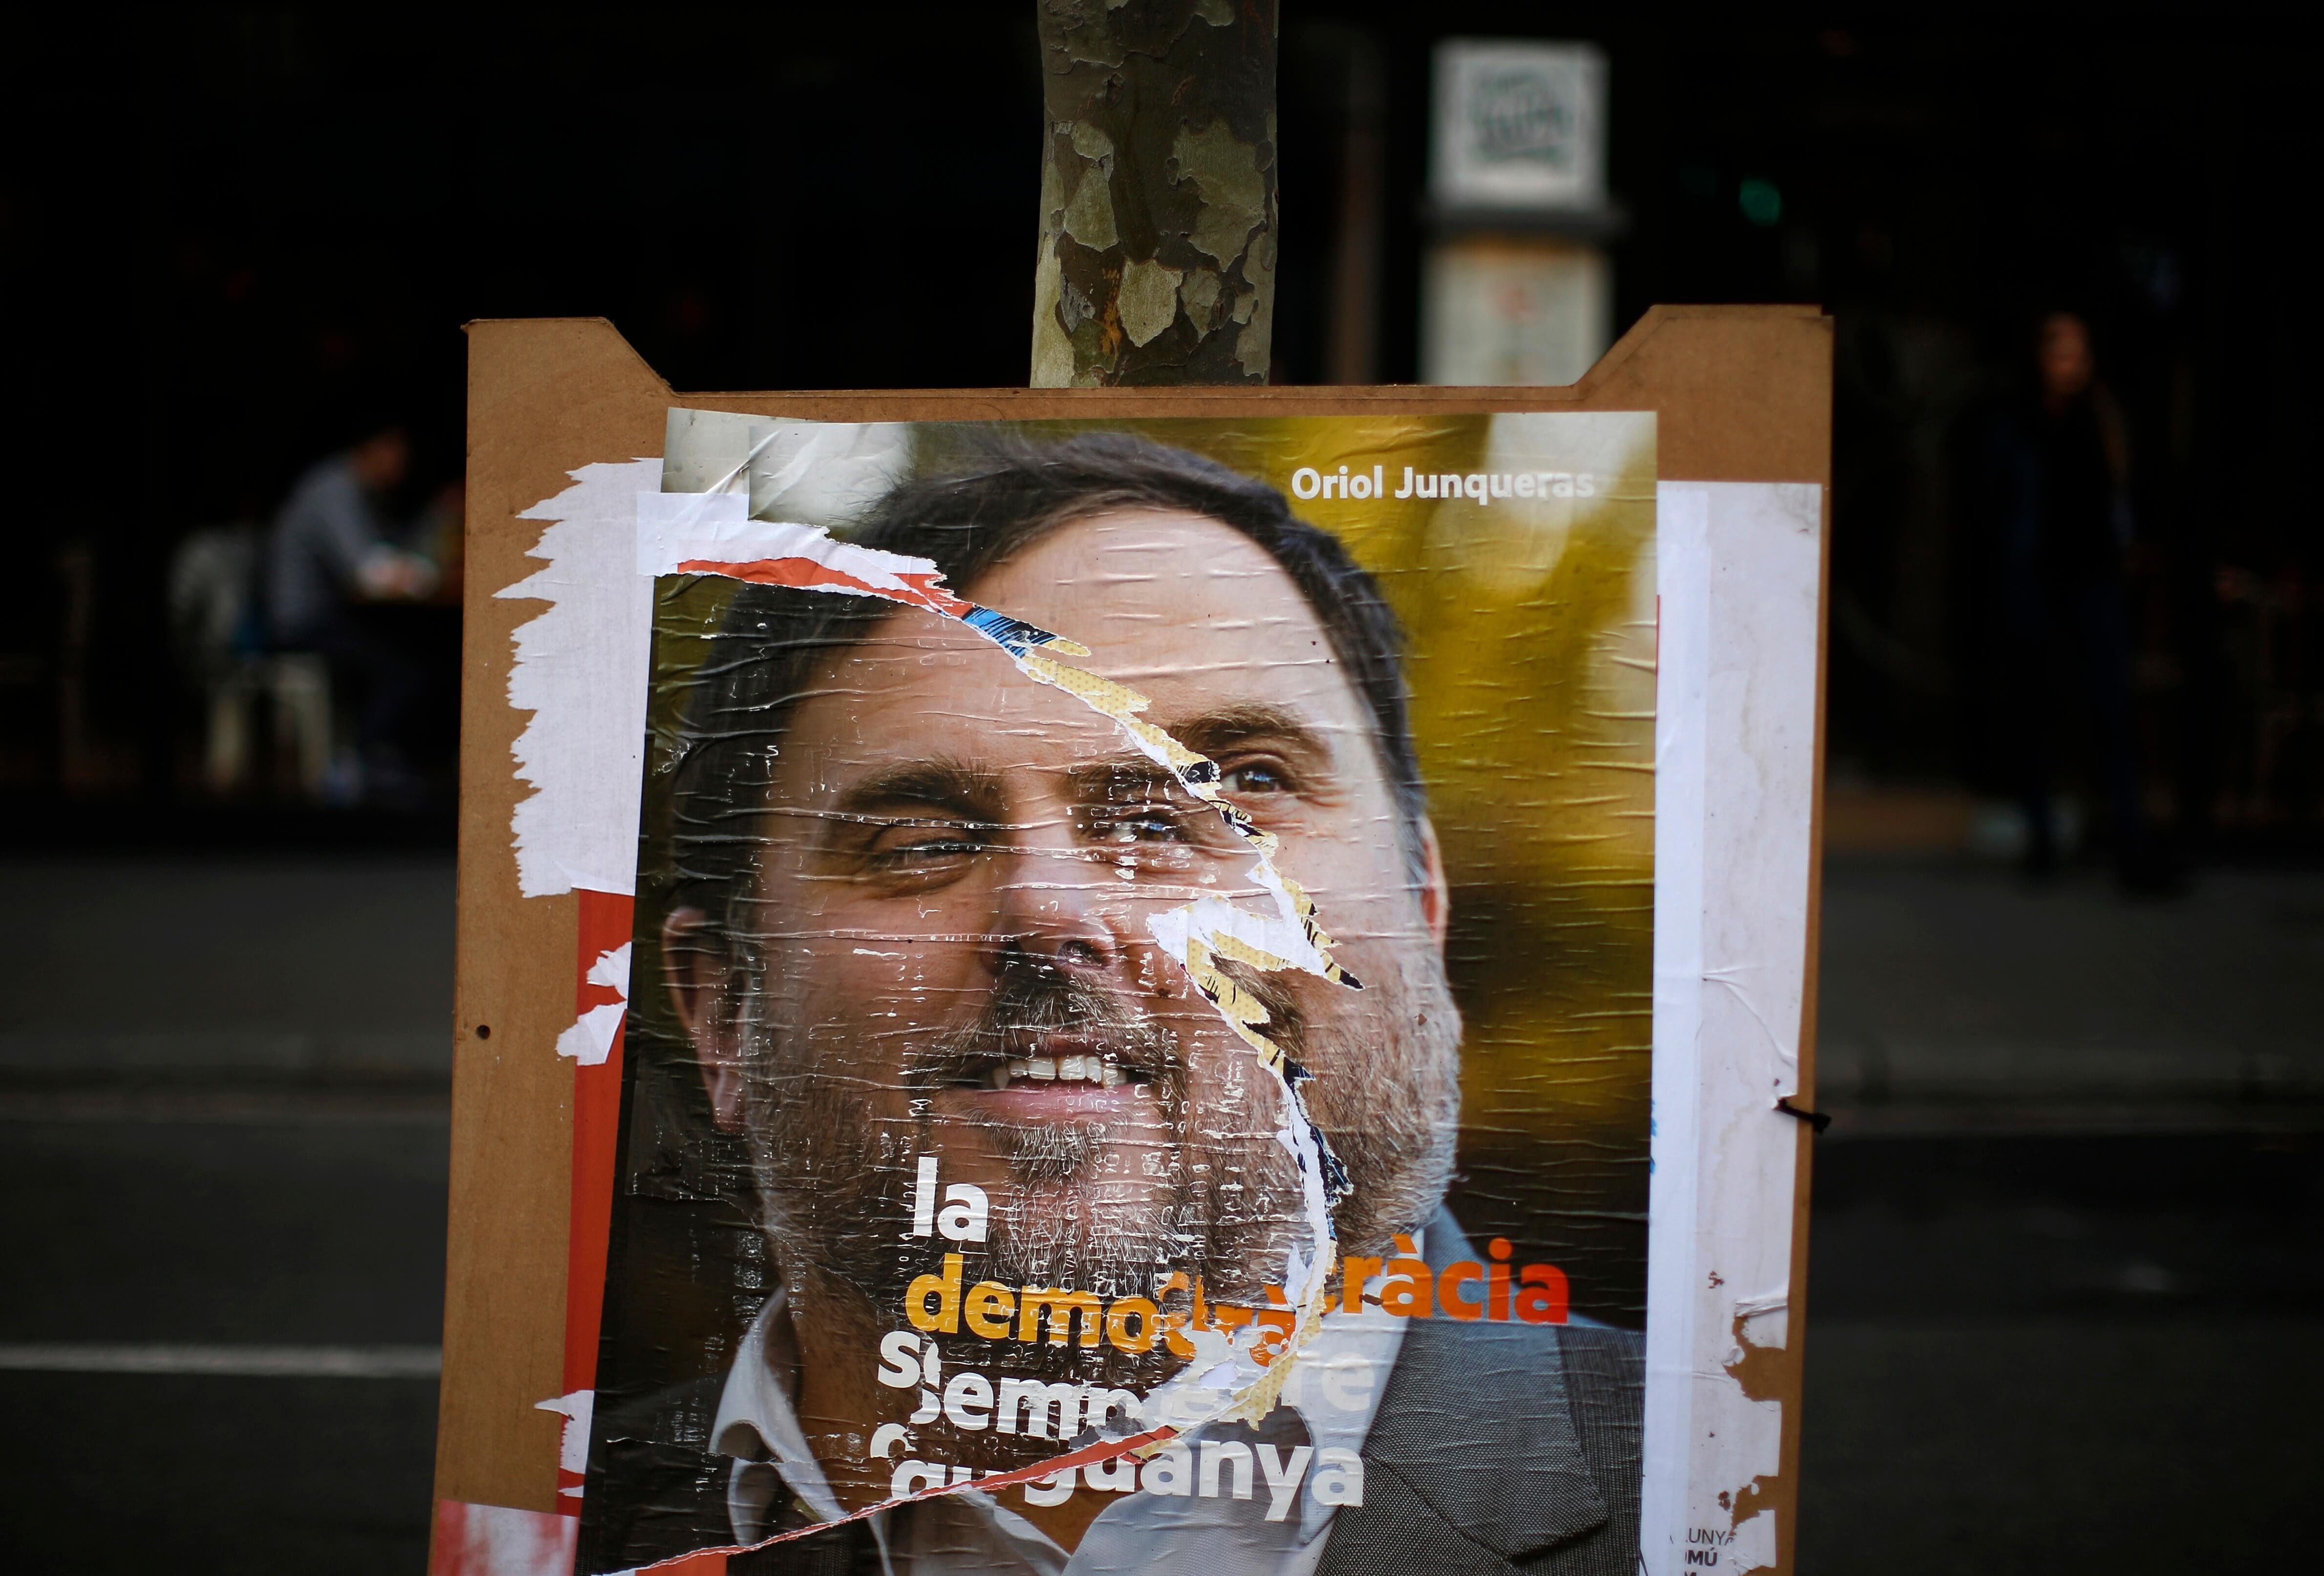 Crisis política catalana ha costado mil millones de euros